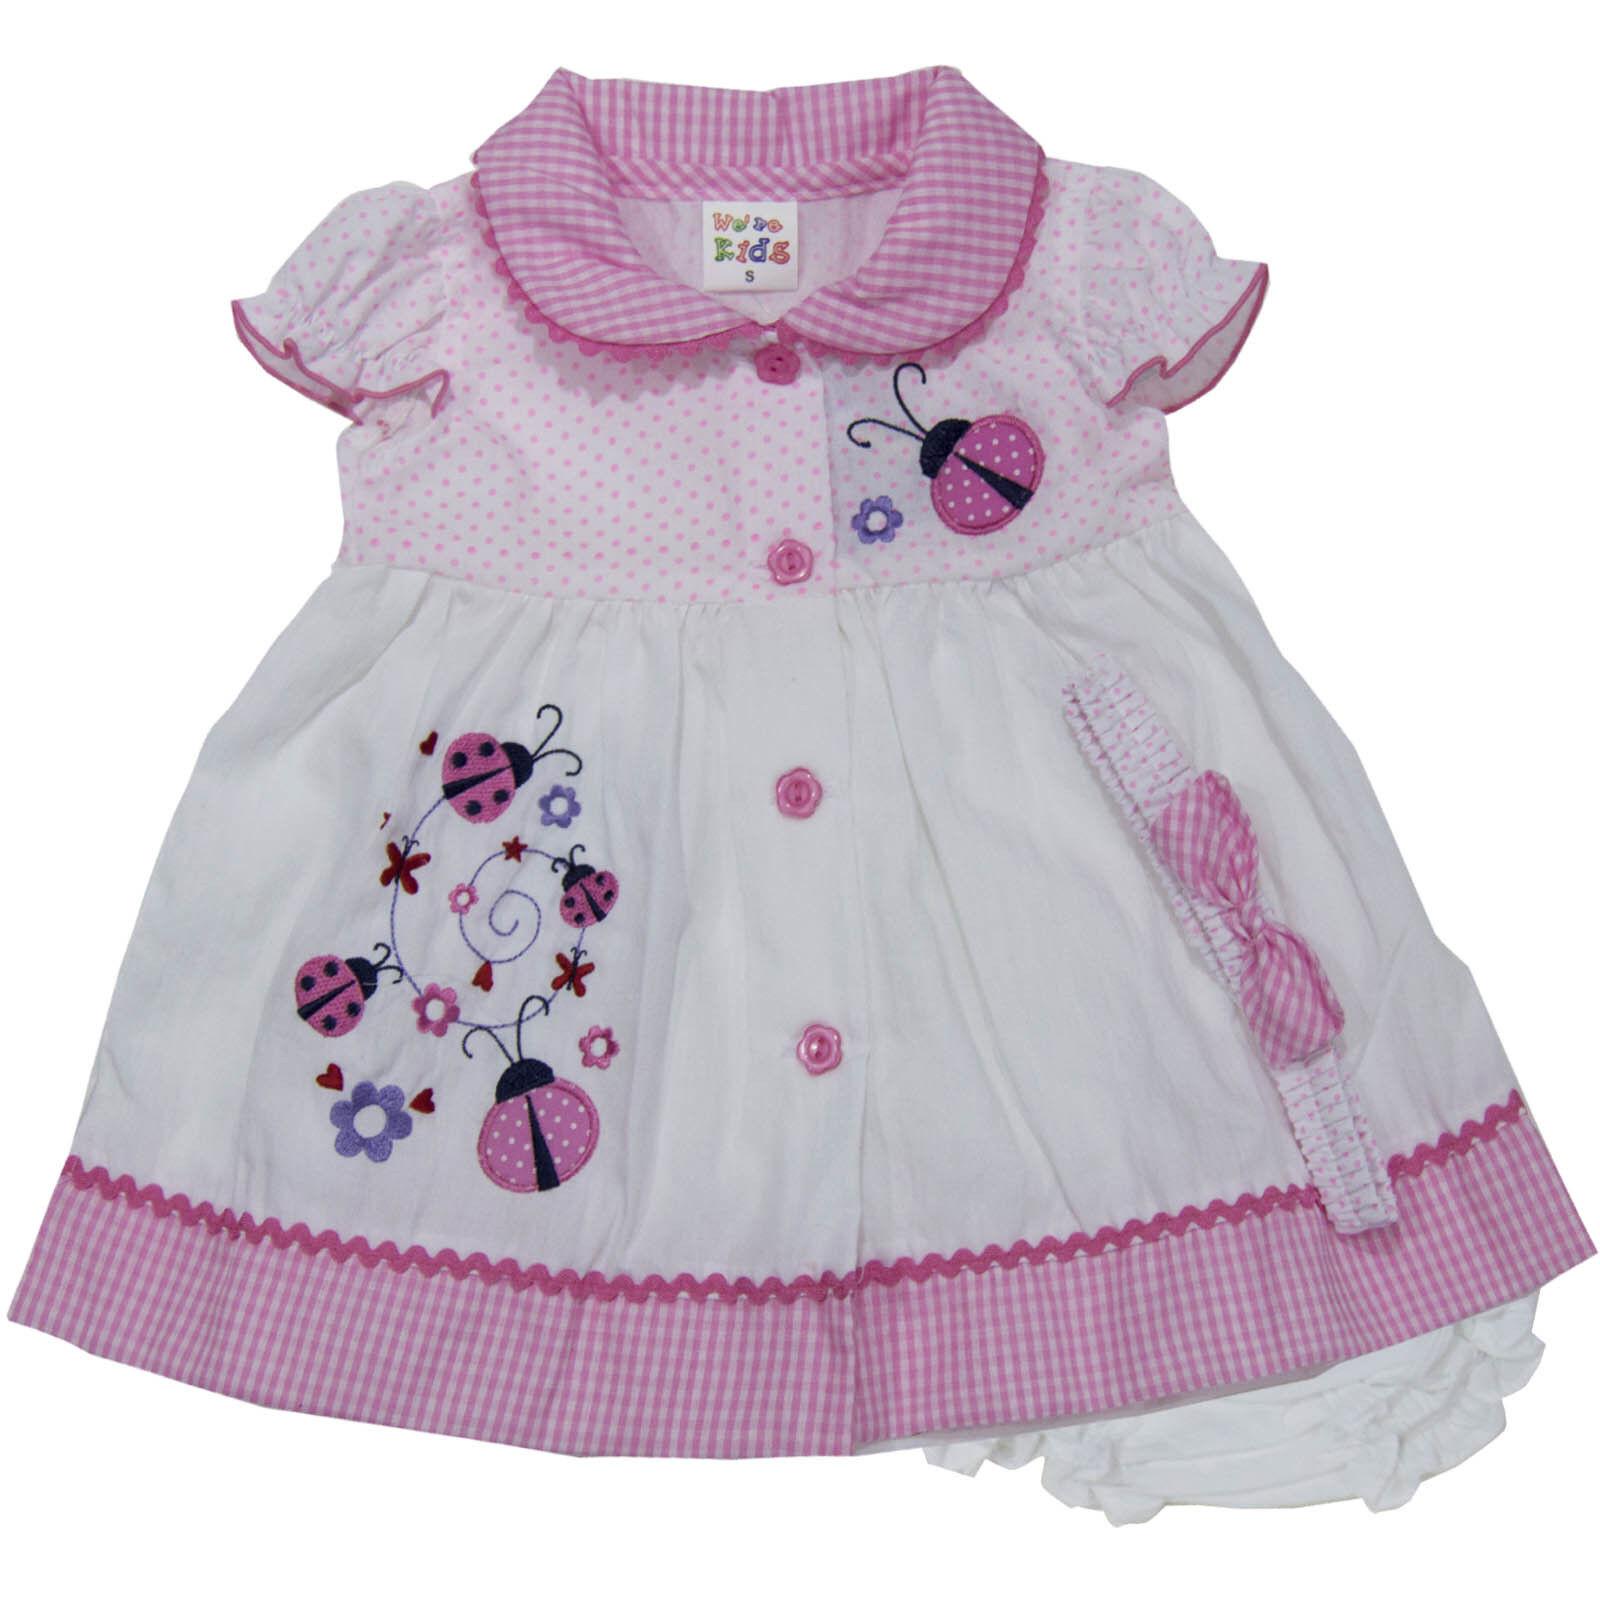 new newborn infant baby girl dress 3 piece set clothing